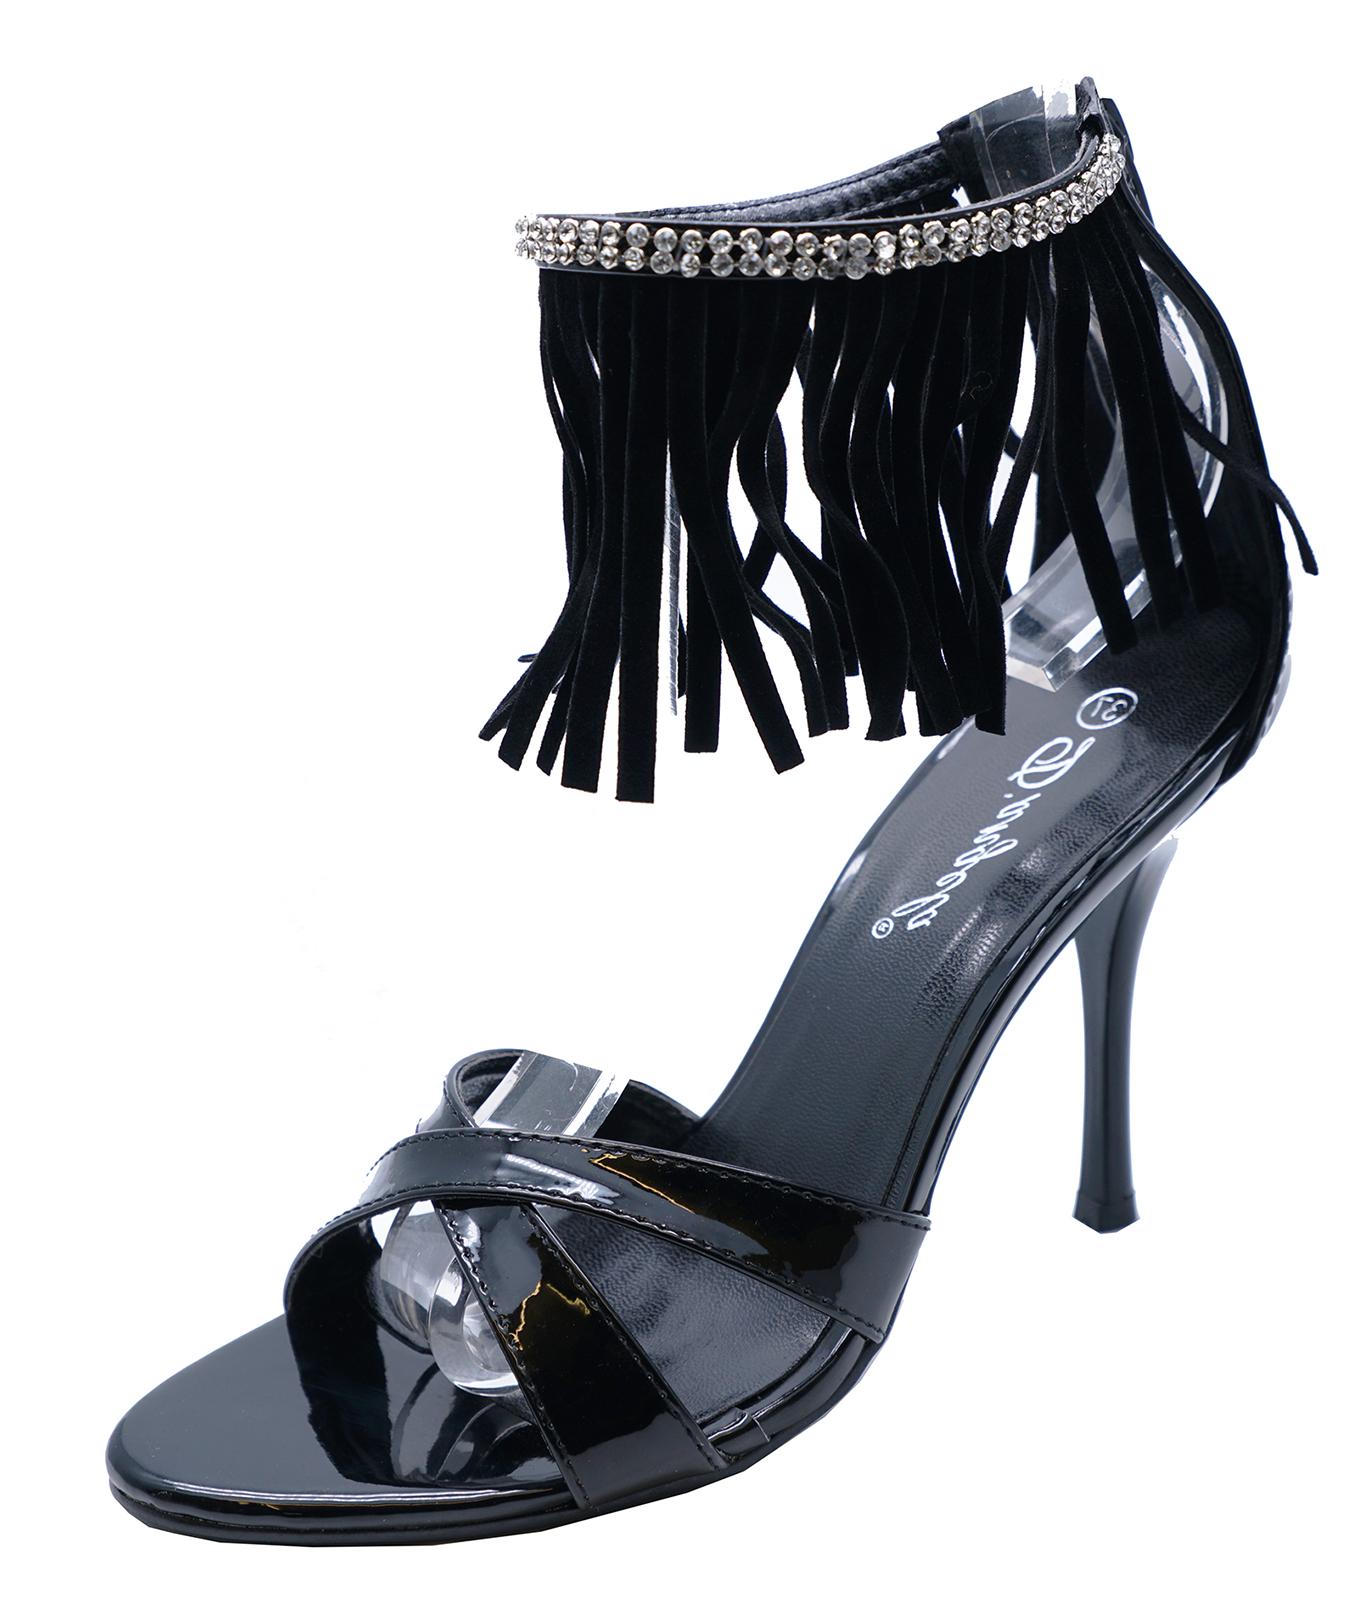 LADIES BLACK STRAPPY PEEP-TOE FRINGE ZIP-UP HIGH-HEEL SANDALS SHOES SIZES 2-7